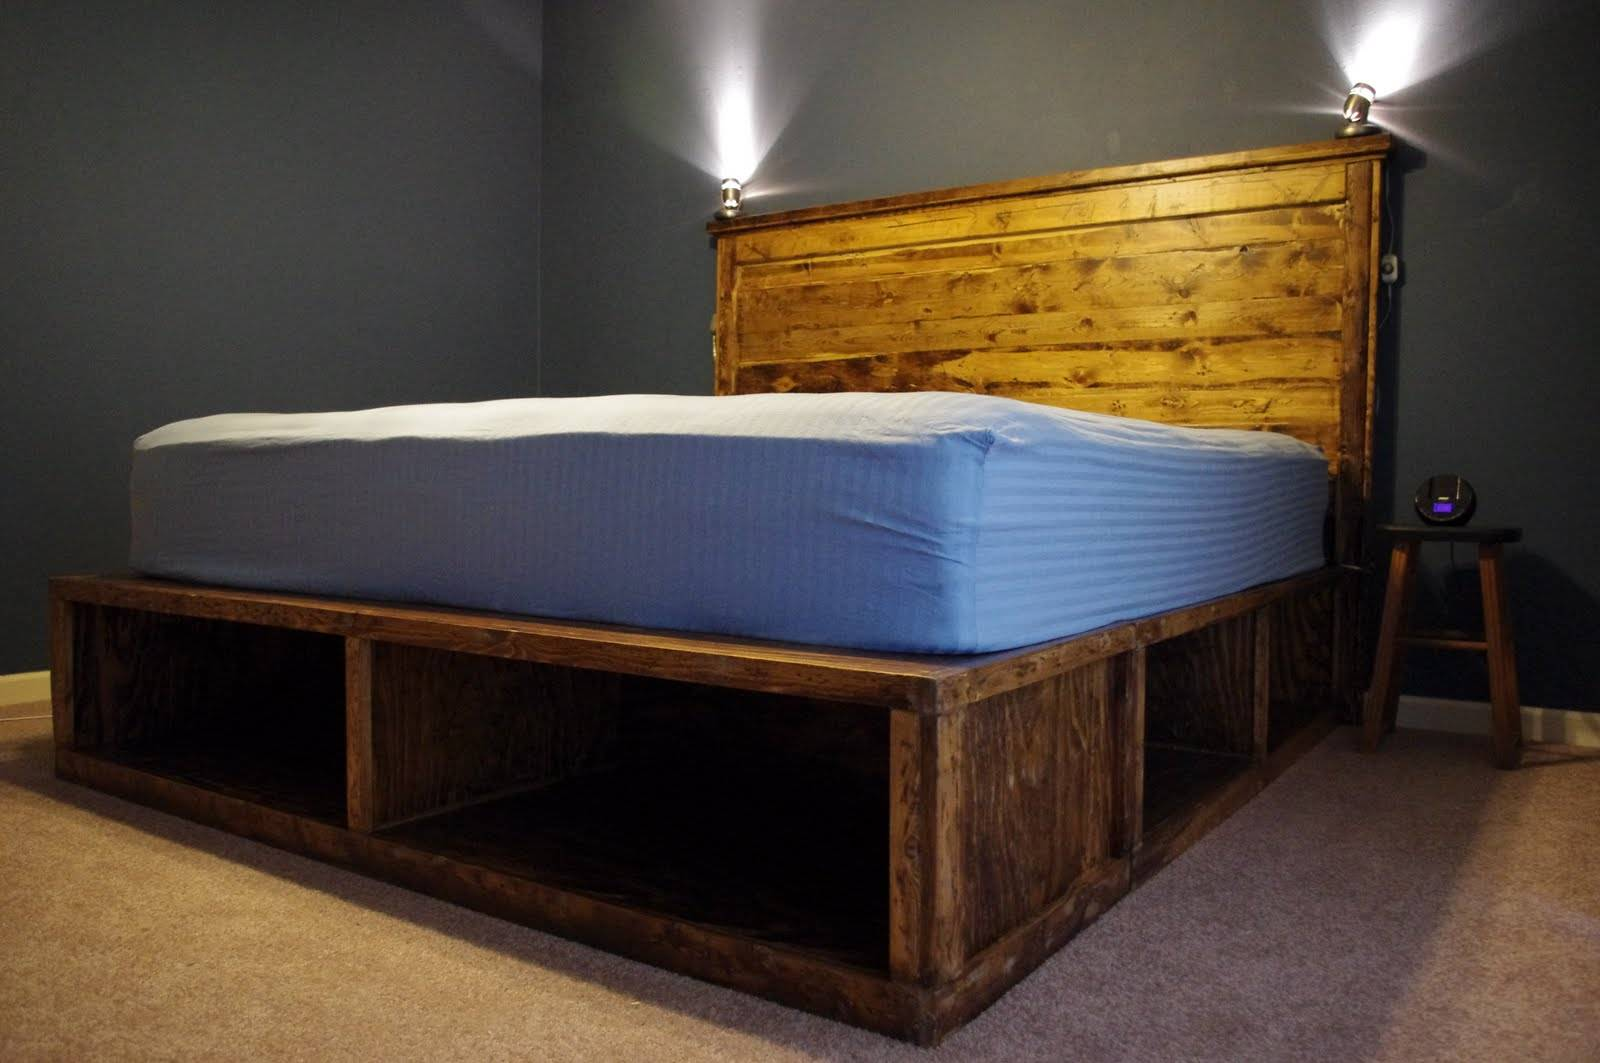 Image of: Plans Build Platform Bed Storage Search Results Web Design House Plans 73877